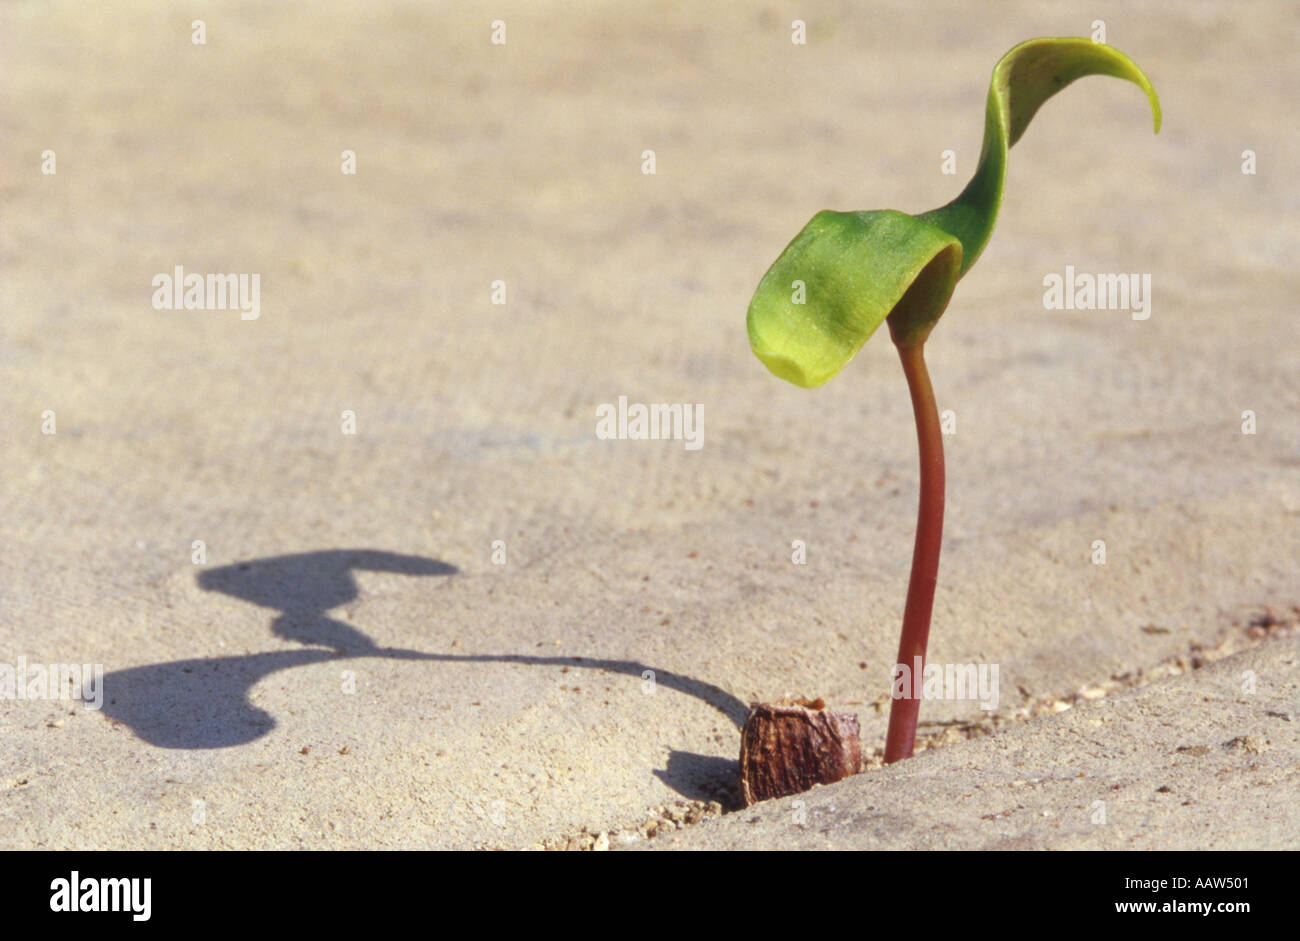 Sycamore Seedling Growing Between Paving Slabs - Stock Image